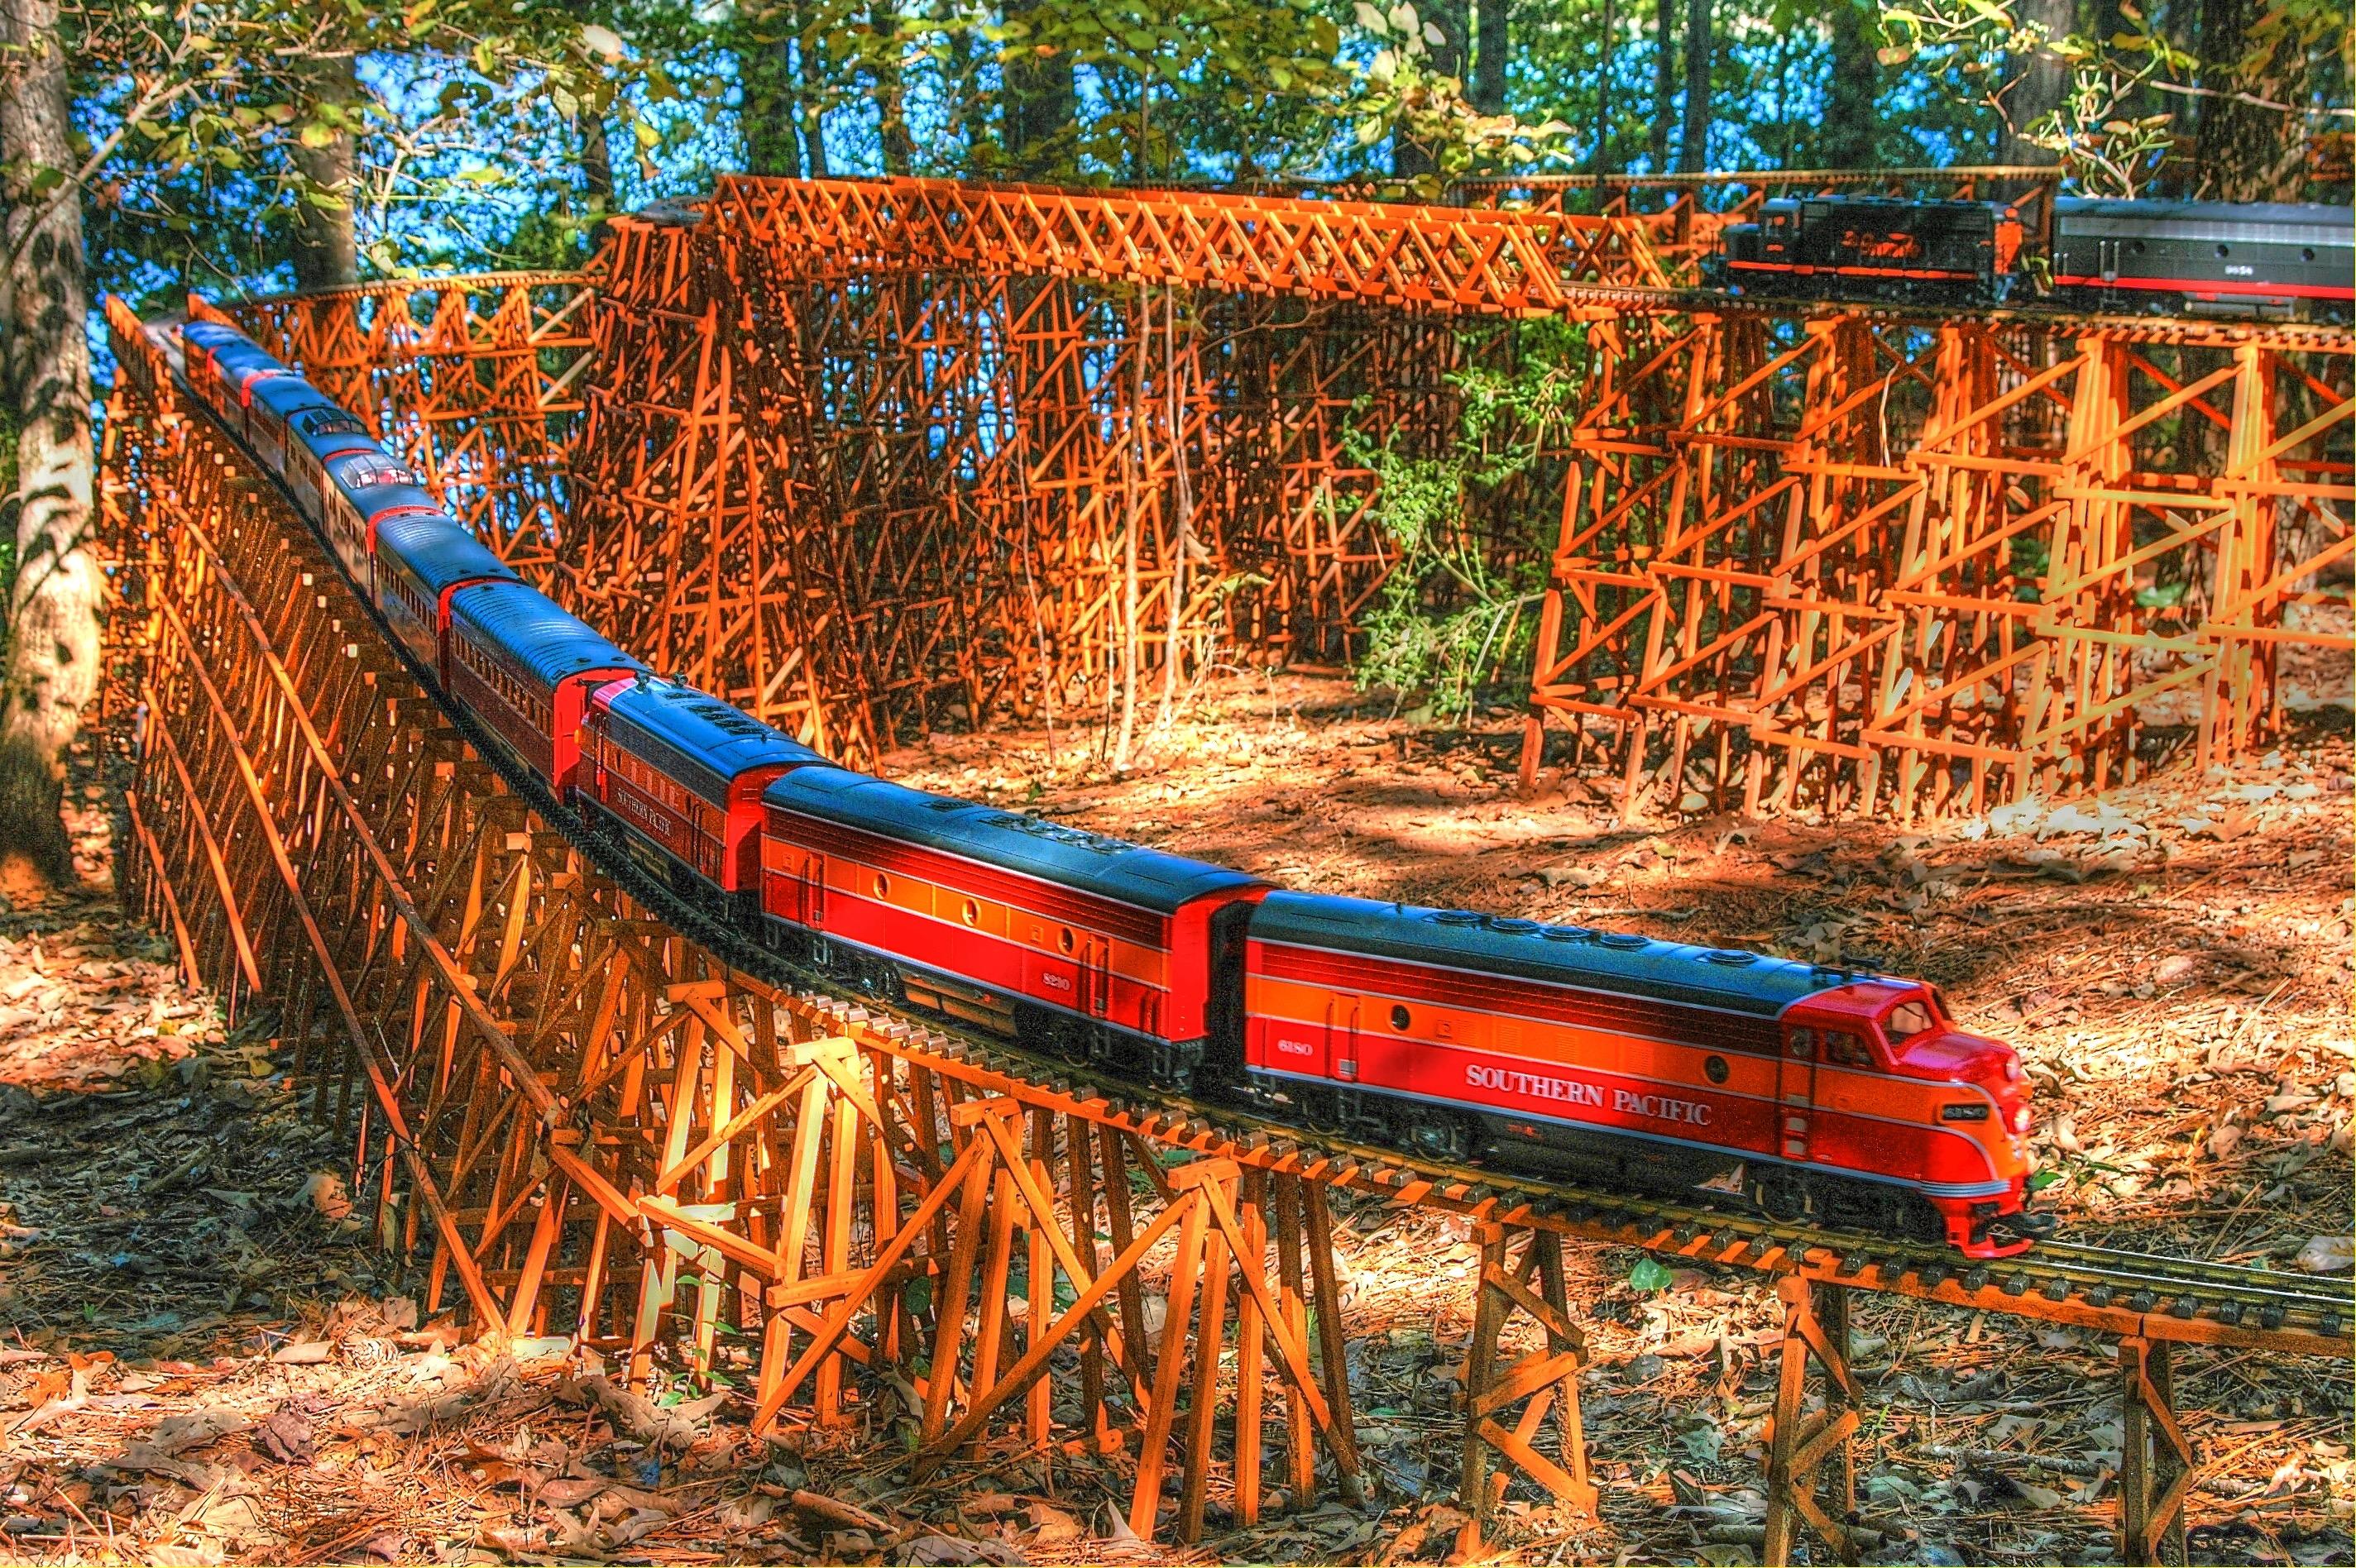 -Garden-Texture Trestle/Bridge